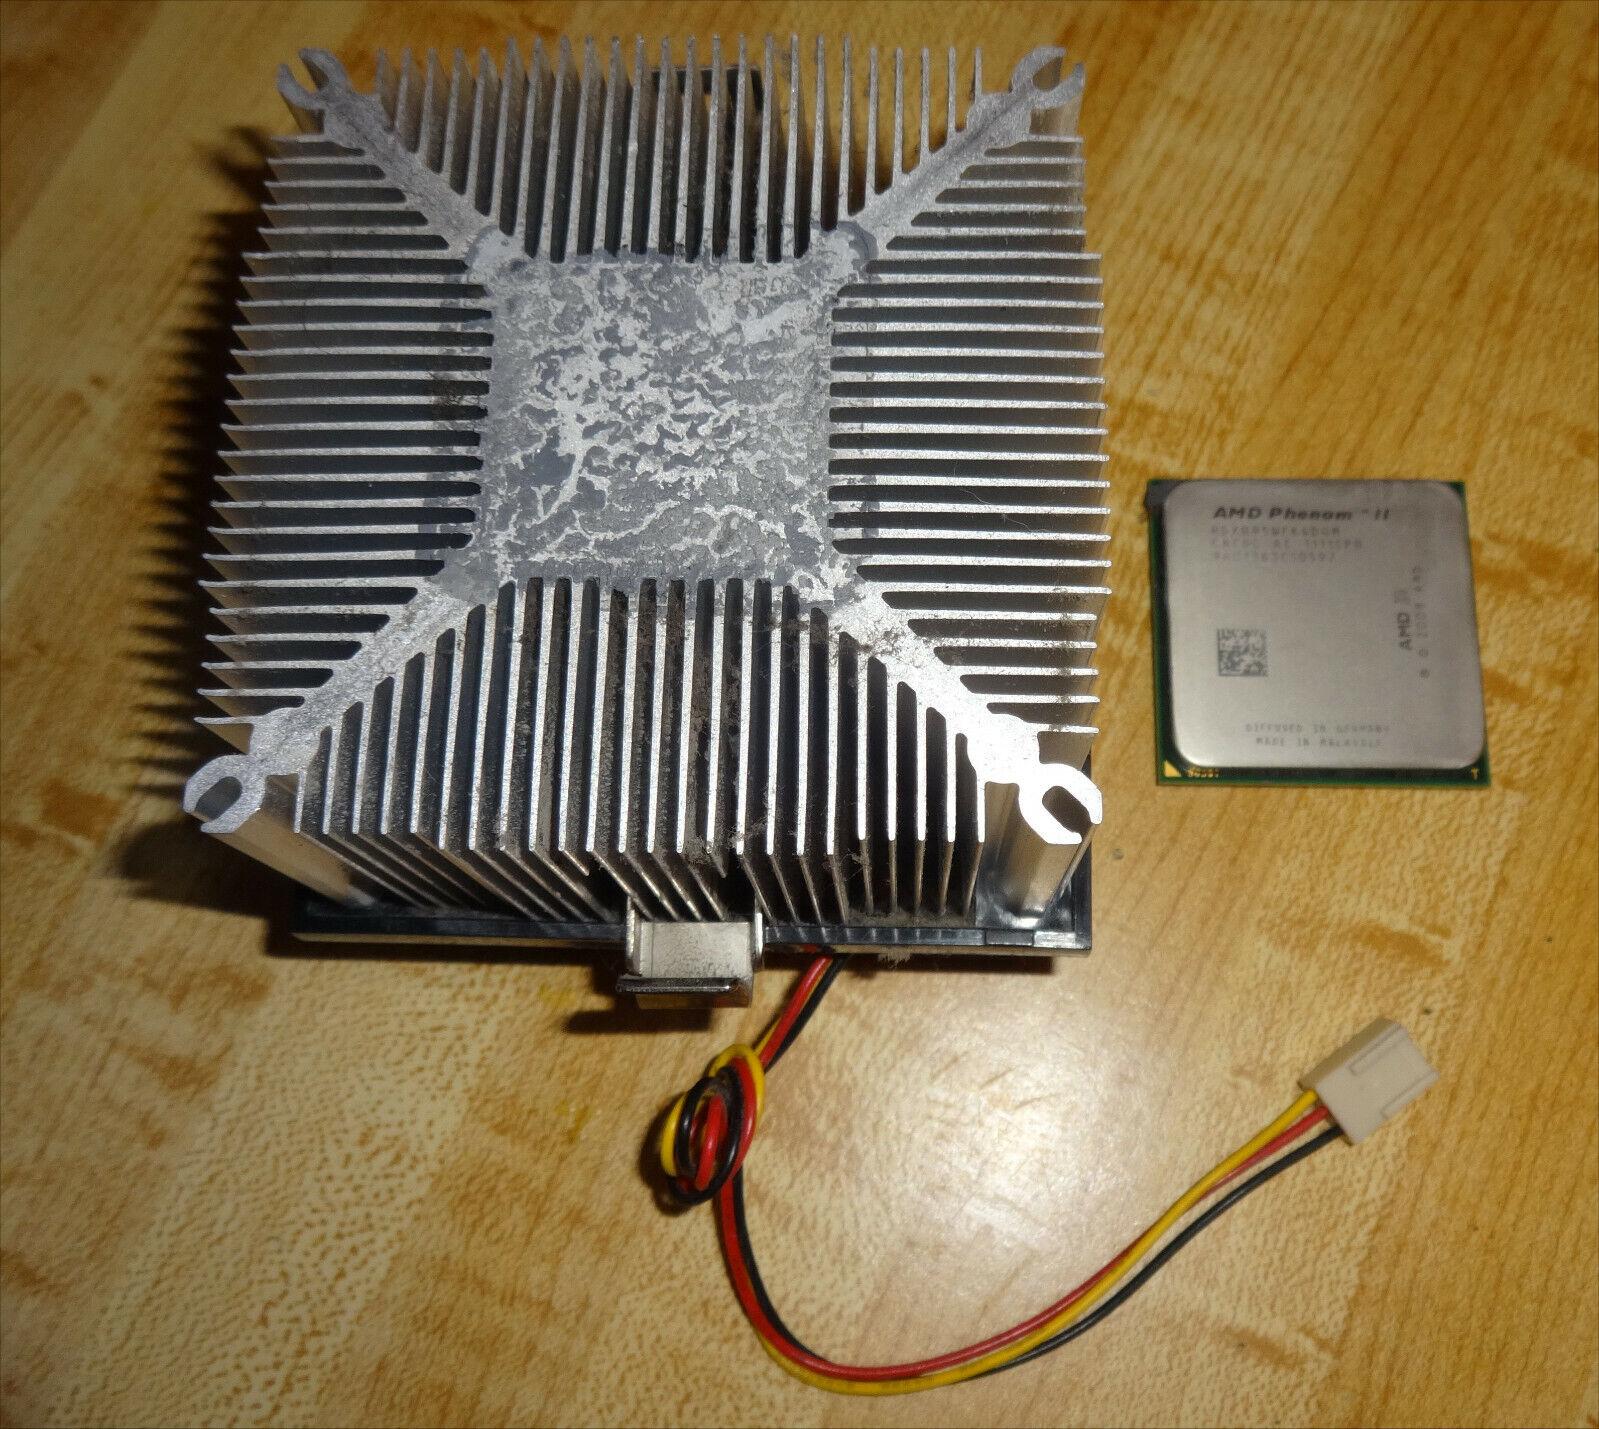 AMD Phenom II X2 545 3.0GHz Dual-Core CPU Processor Socket AM3